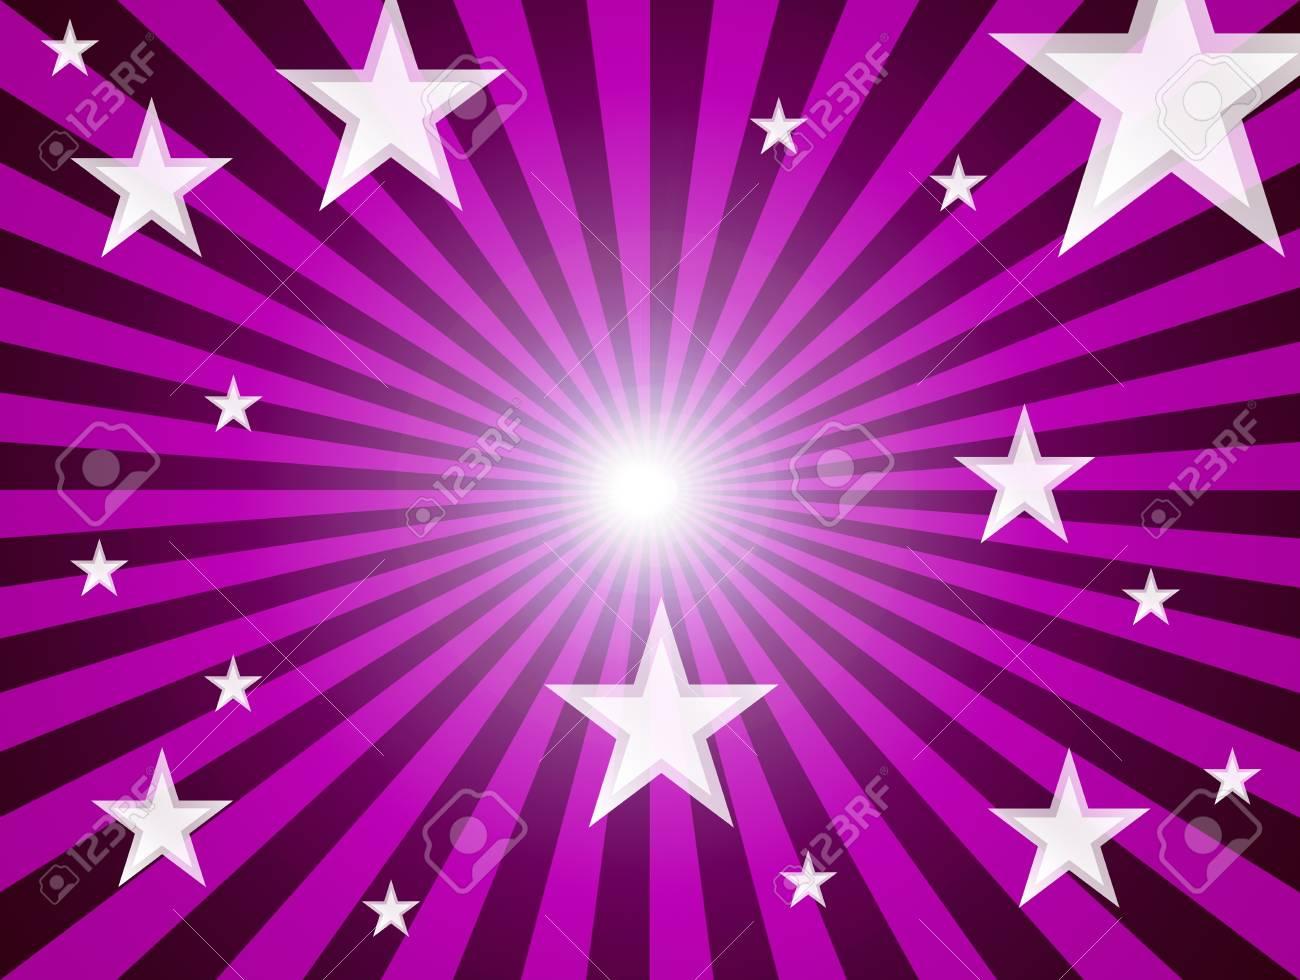 White staras over purple lines background. Abstract illustration Stock Illustration - 9692998